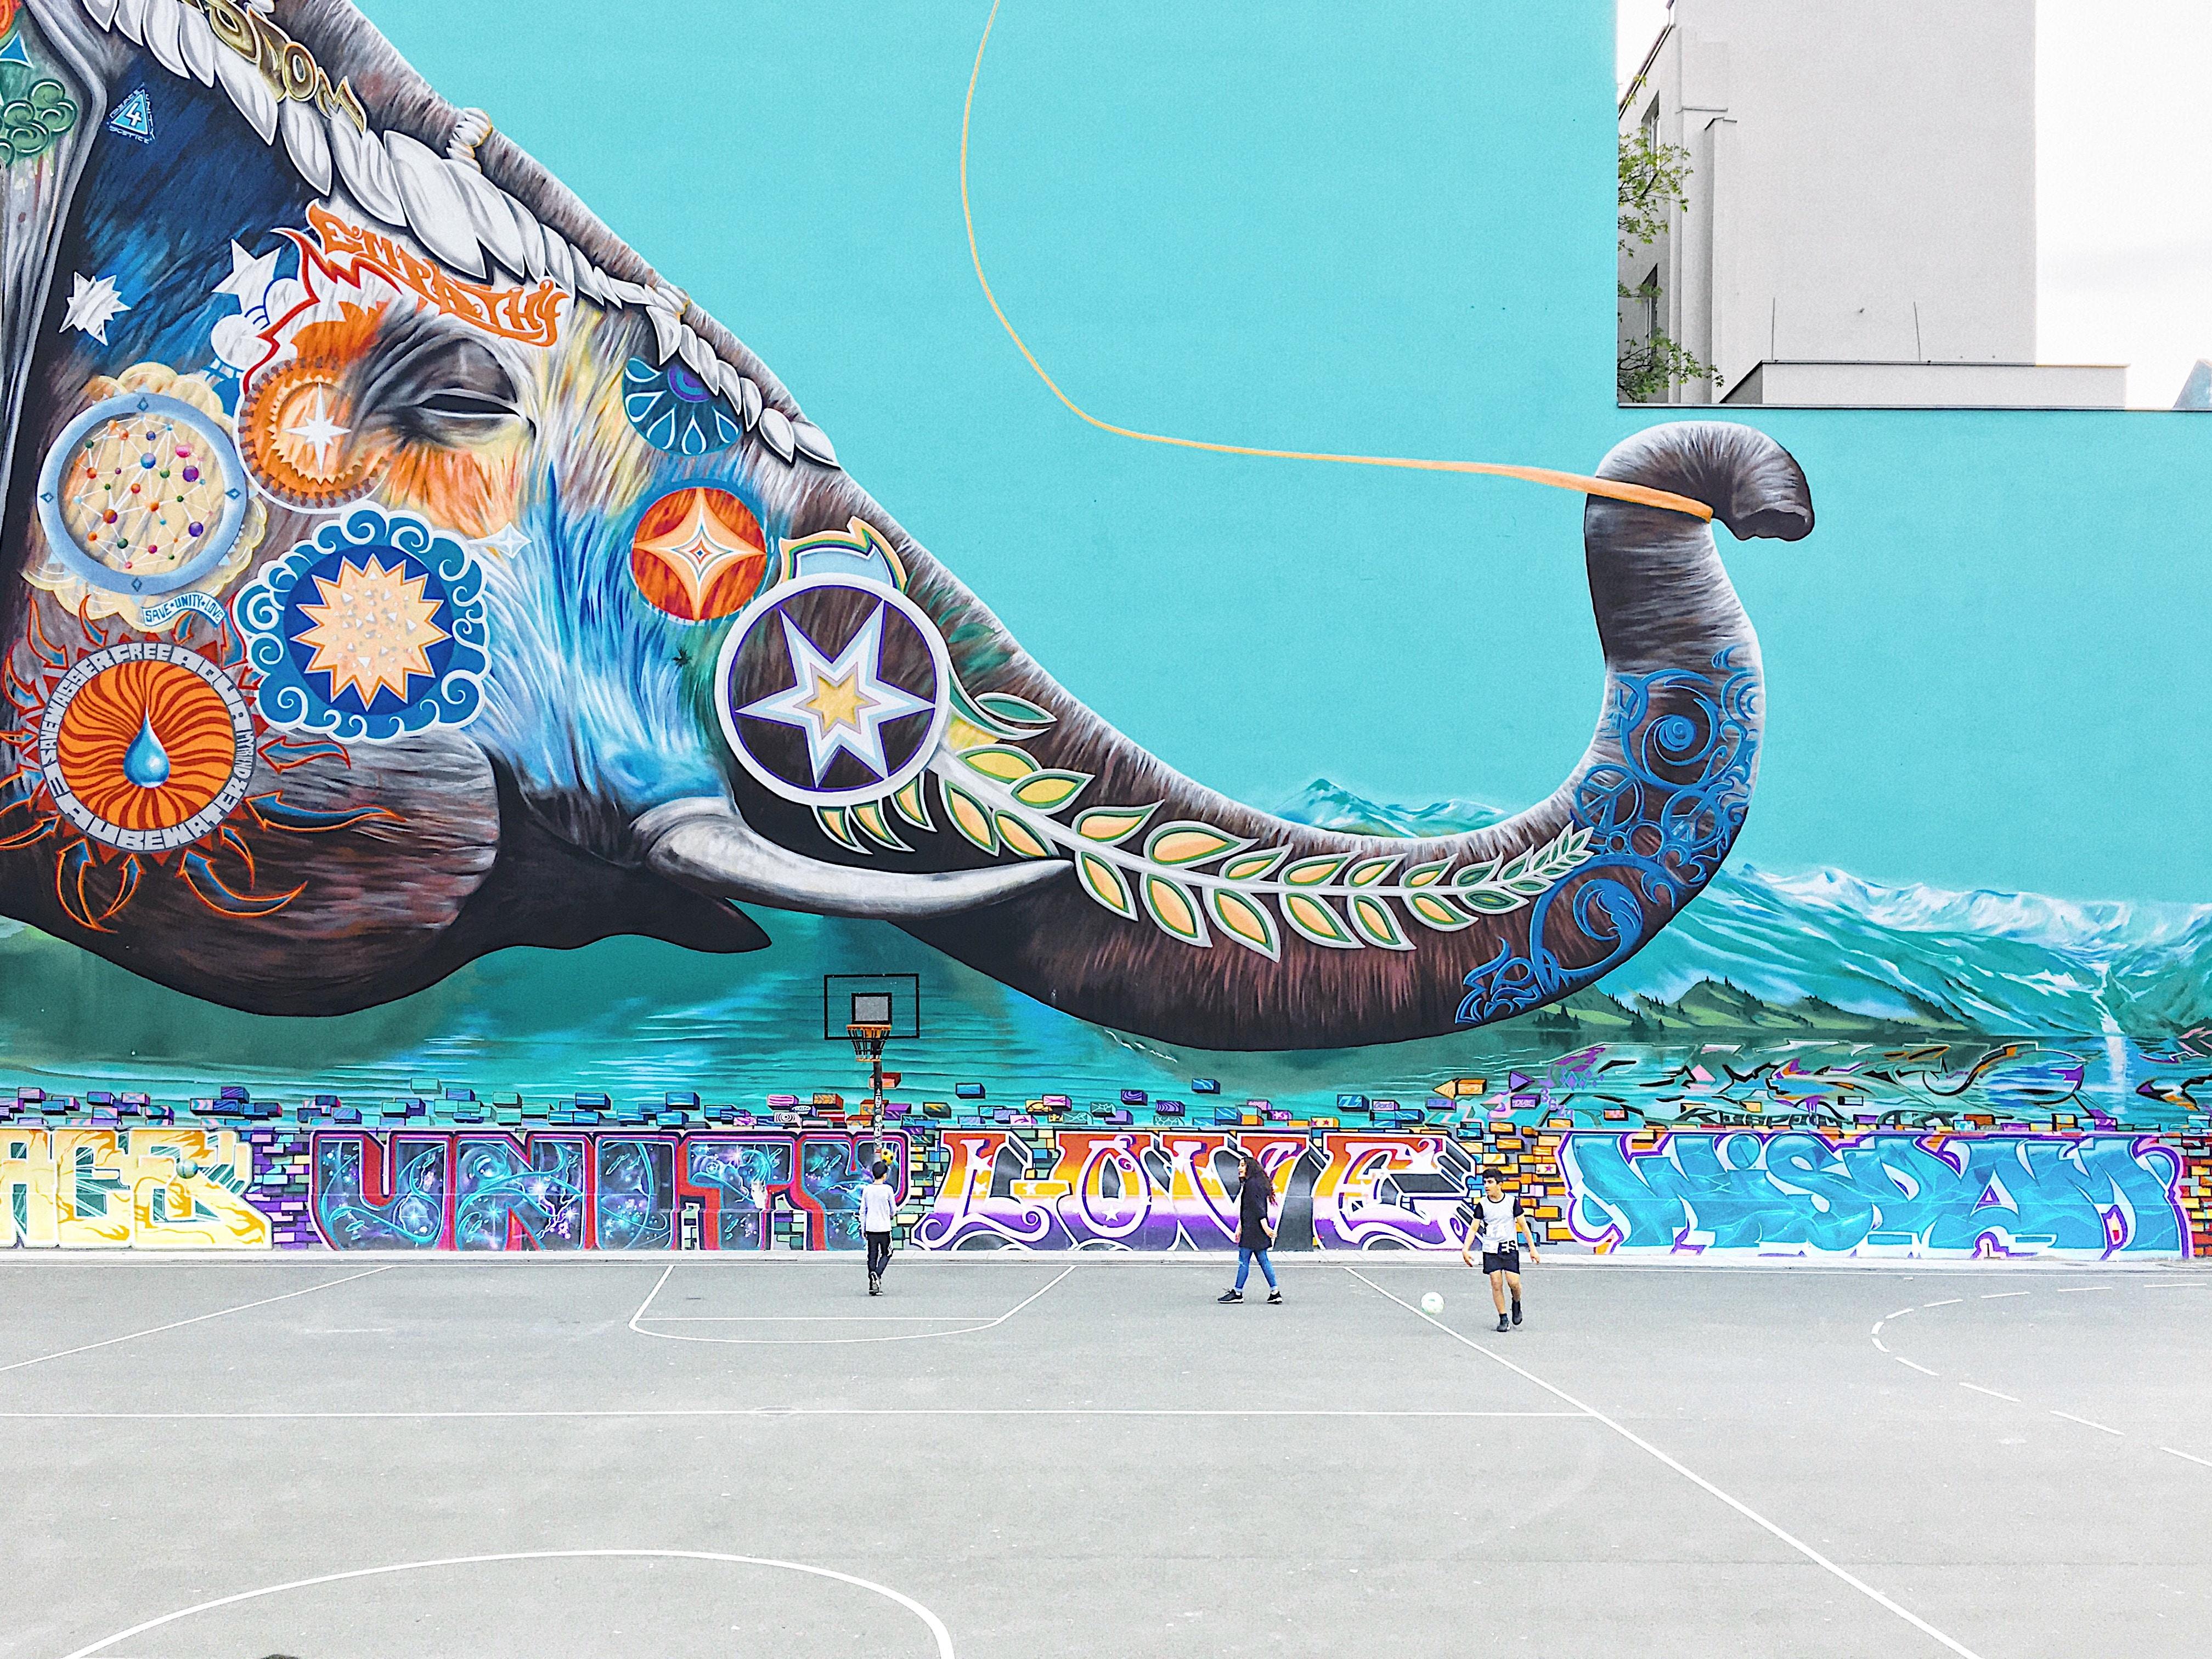 Audrey Hepburn Wall Mural Street Art Pictures Hd Download Free Images On Unsplash